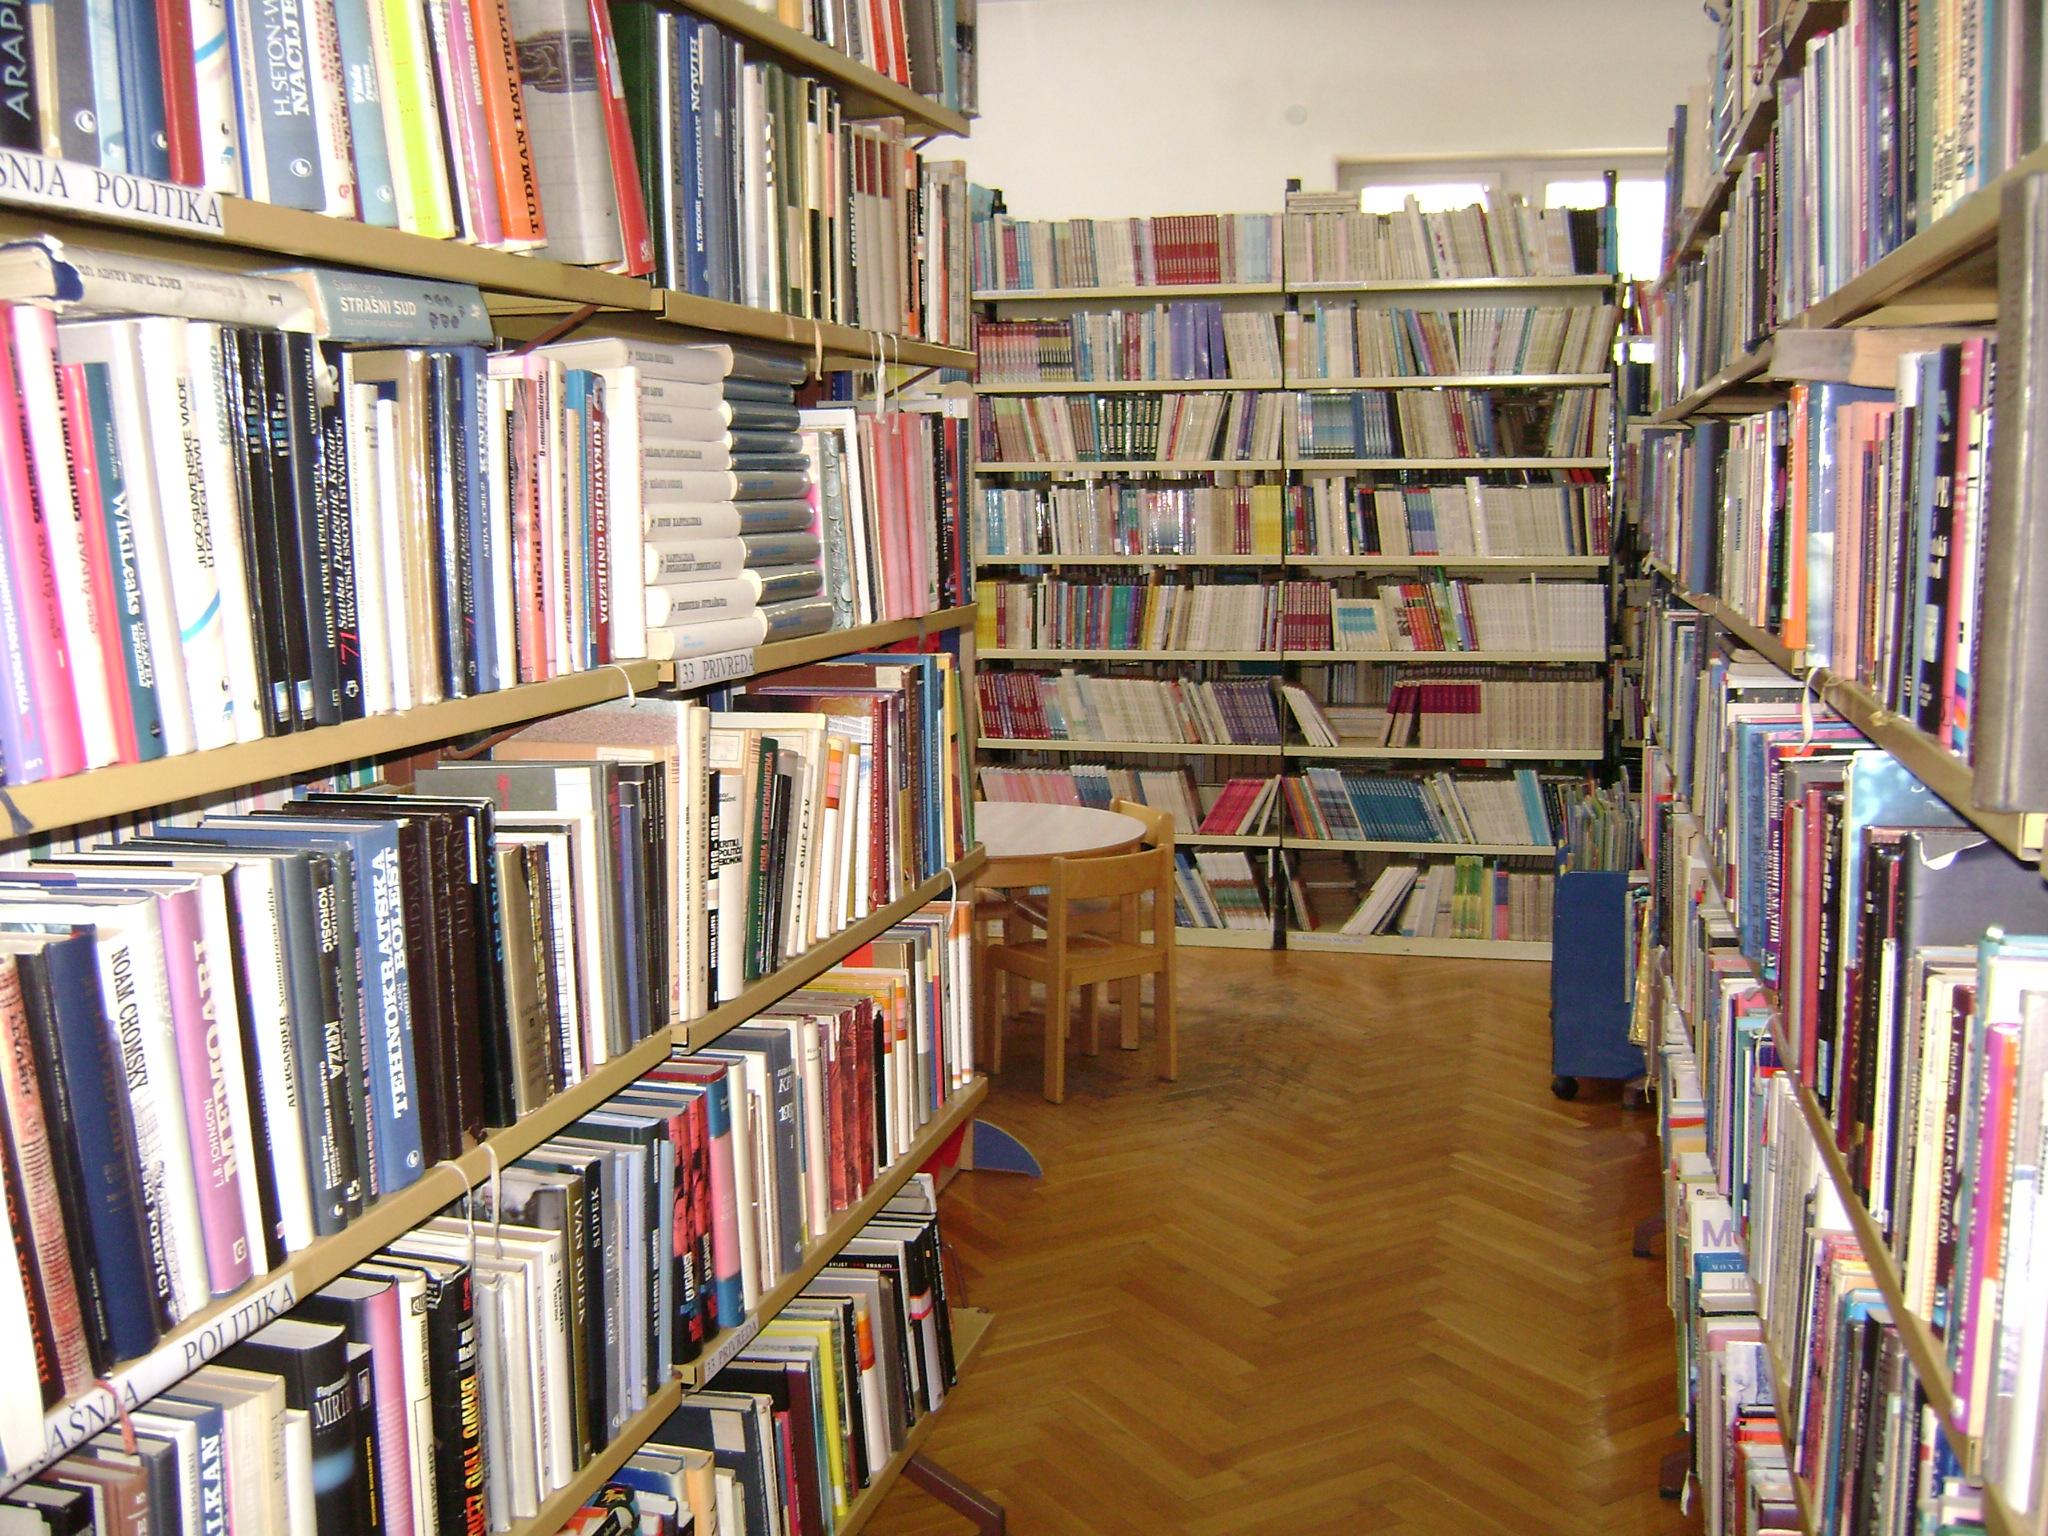 knjižnica 084